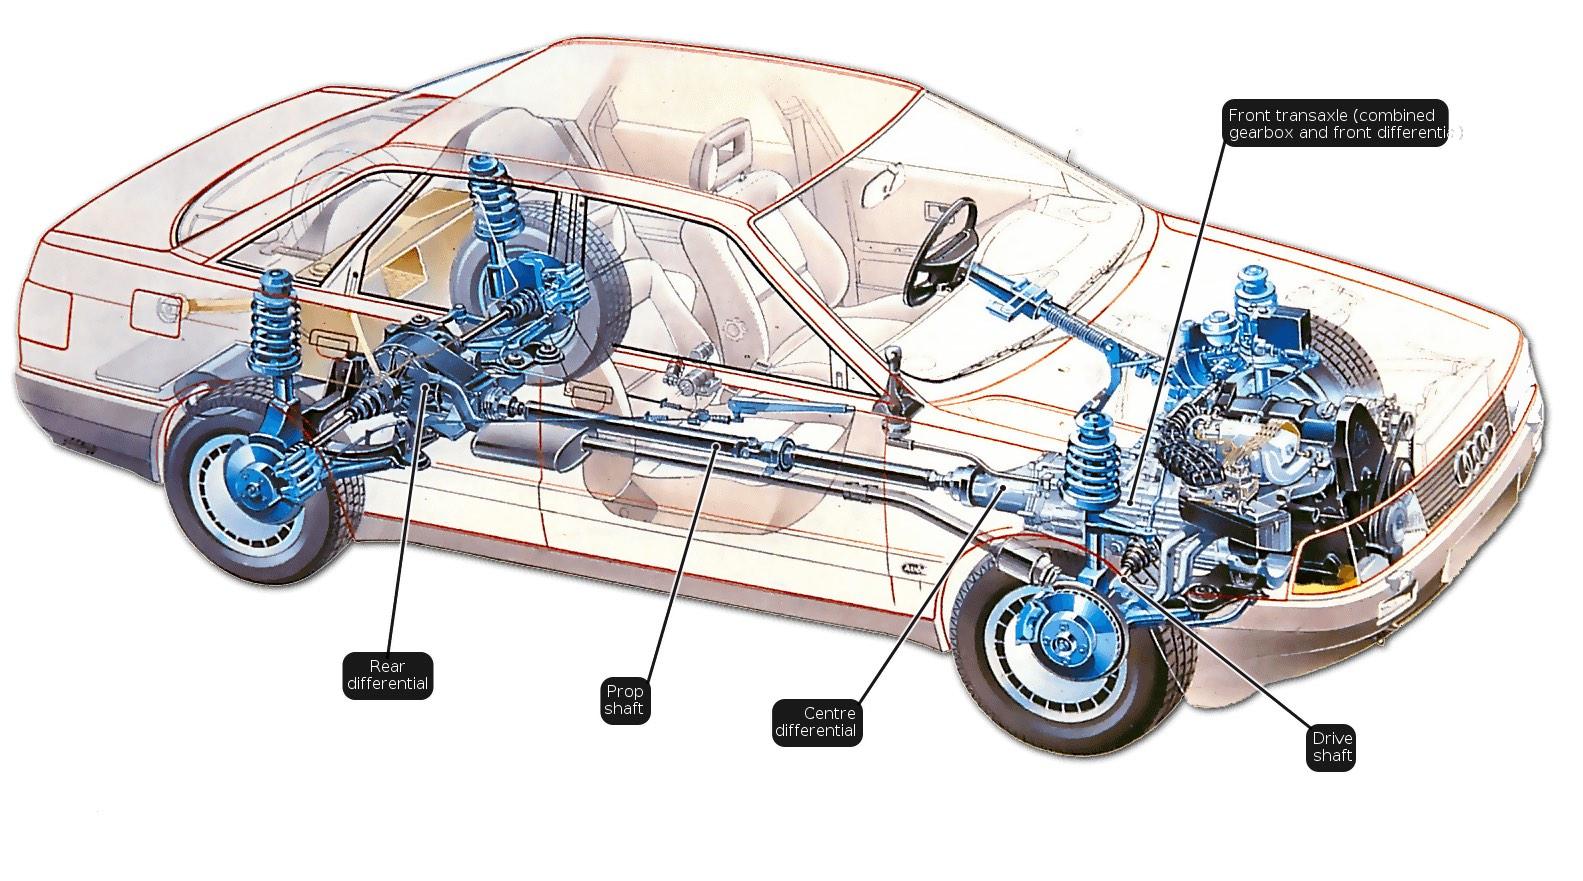 Atsg transmissions workshop repair service manual pagelarge sample atsg transmission matsgallopespdf fandeluxe Gallery